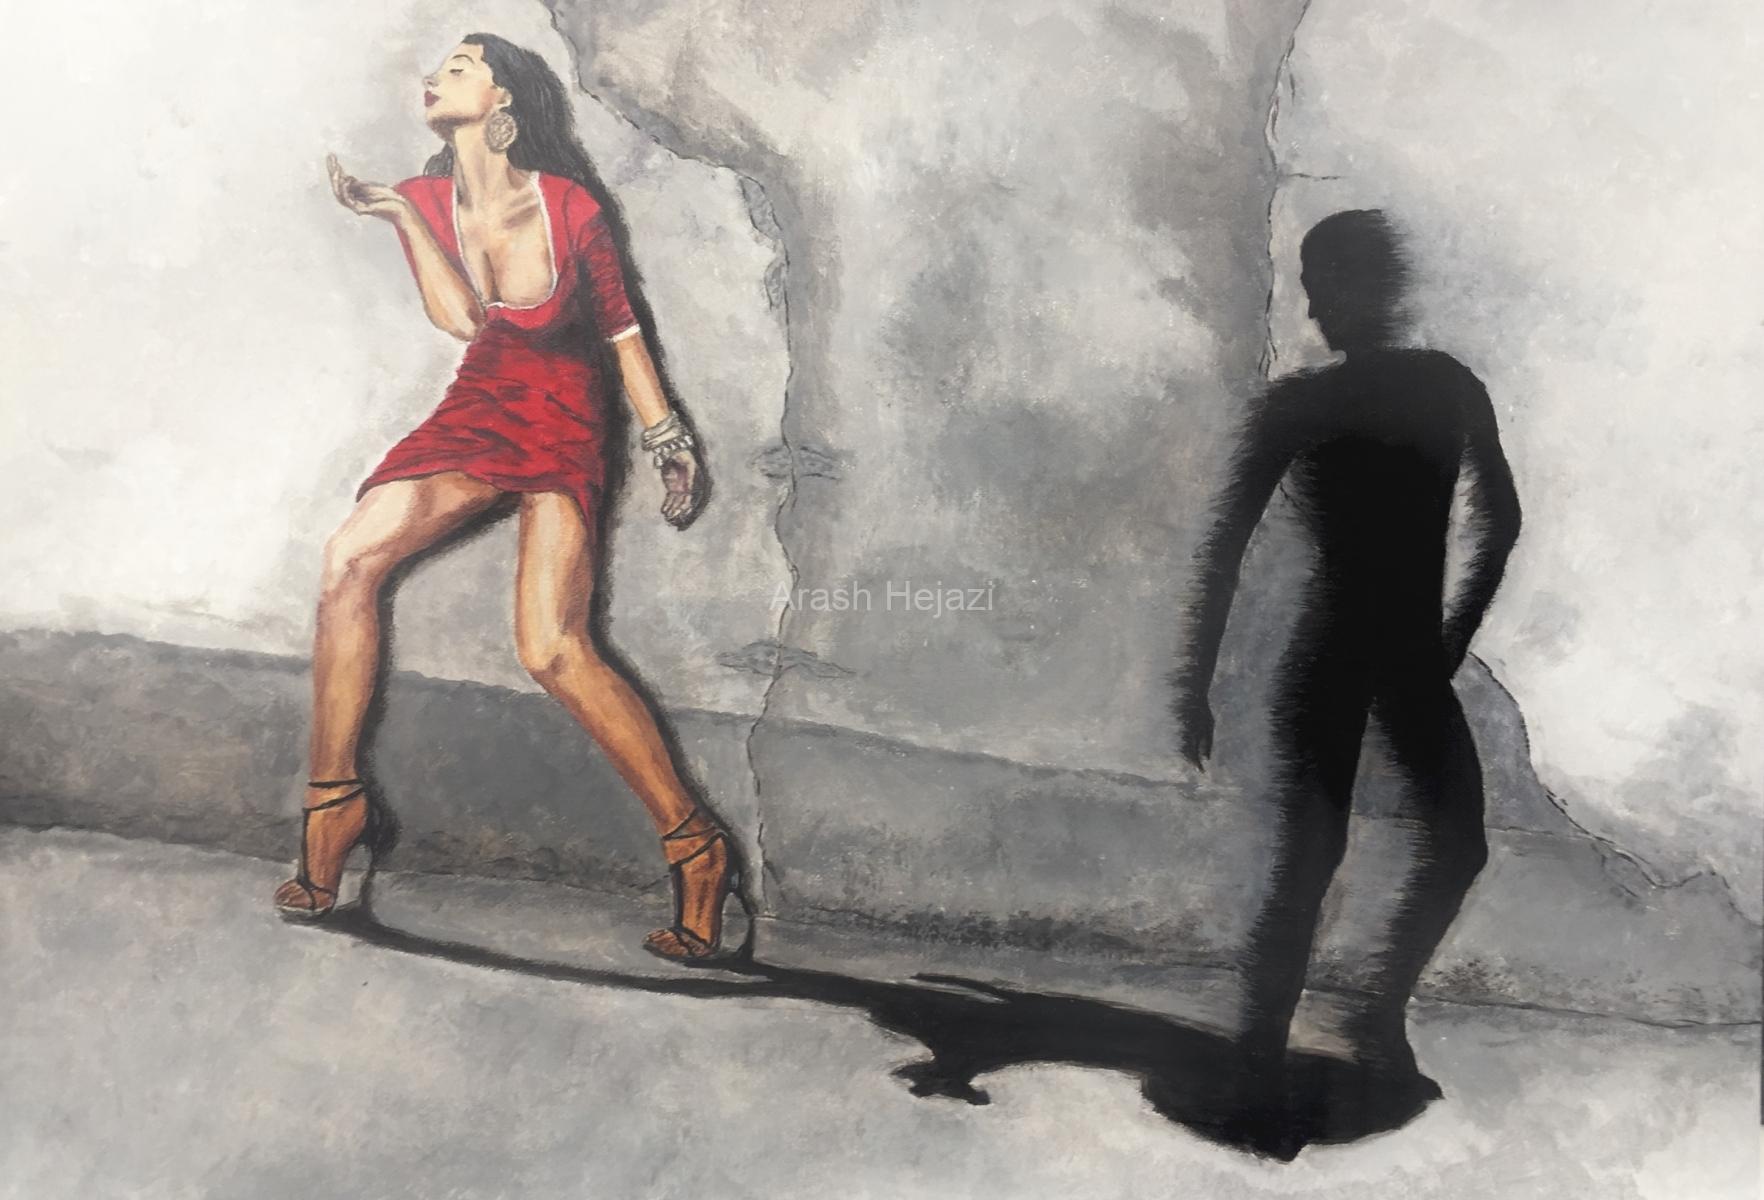 The woman with no names - Arash Hejazi - 2018